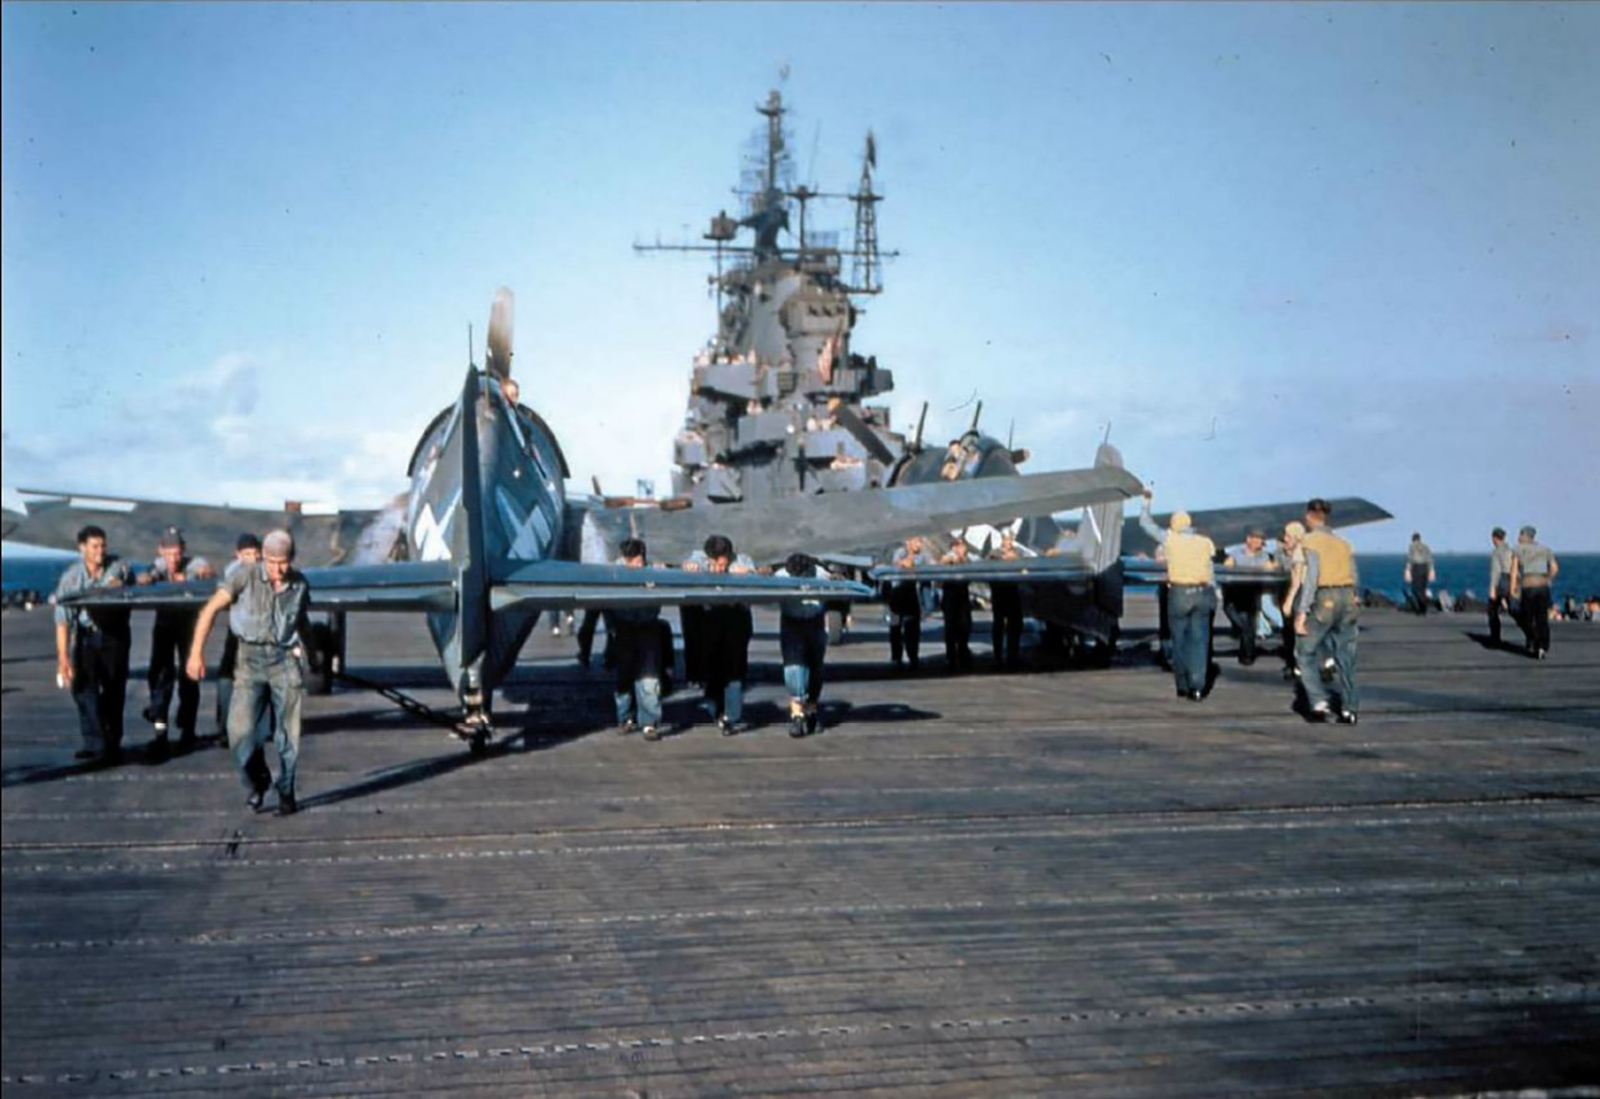 Grumman F6F 3 Hellcat belonging to VF 5 being manouvered by deck crew 01